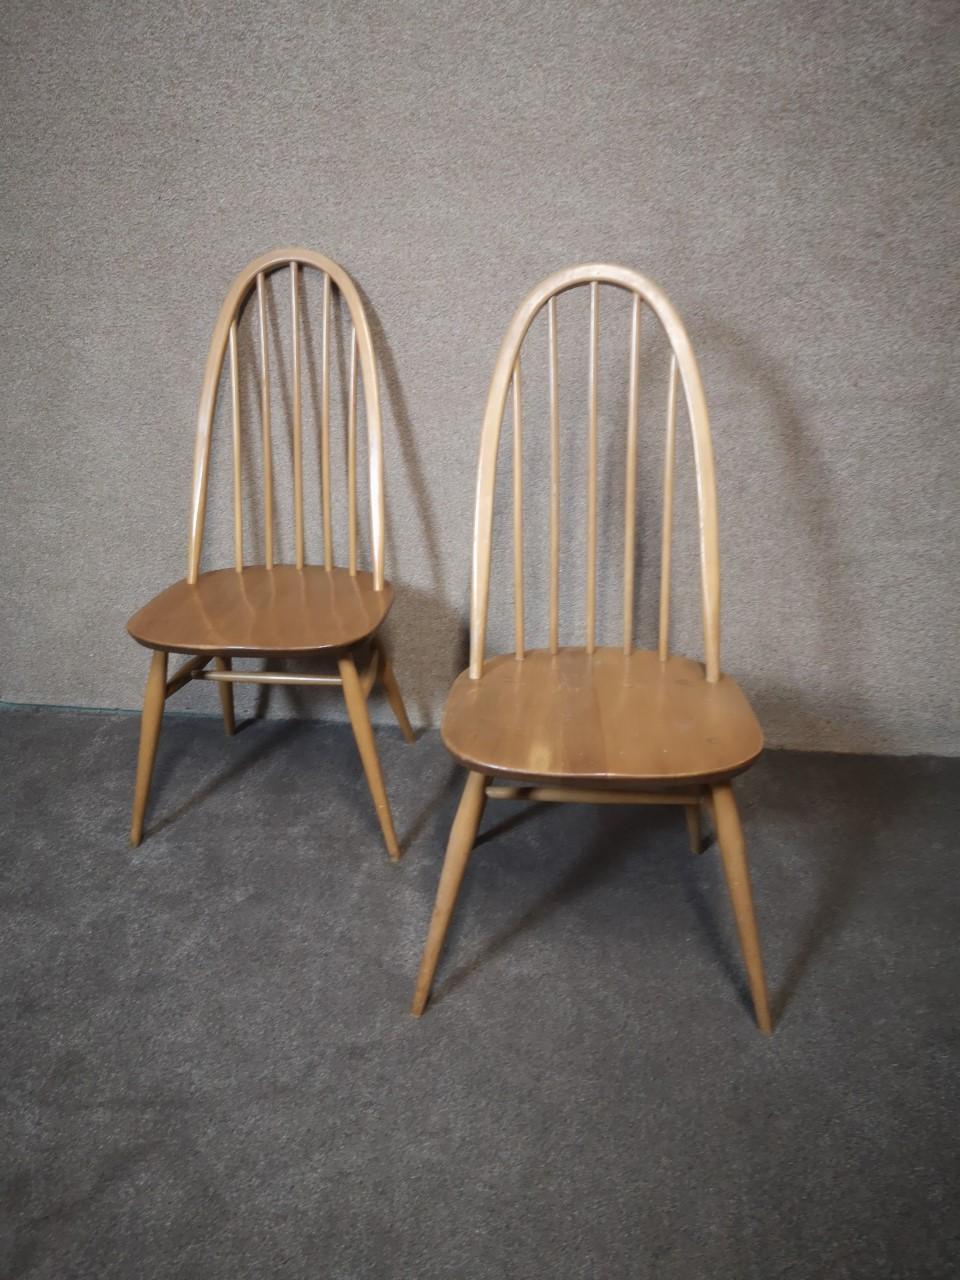 2 Ercol chairs (quaker_light)画像